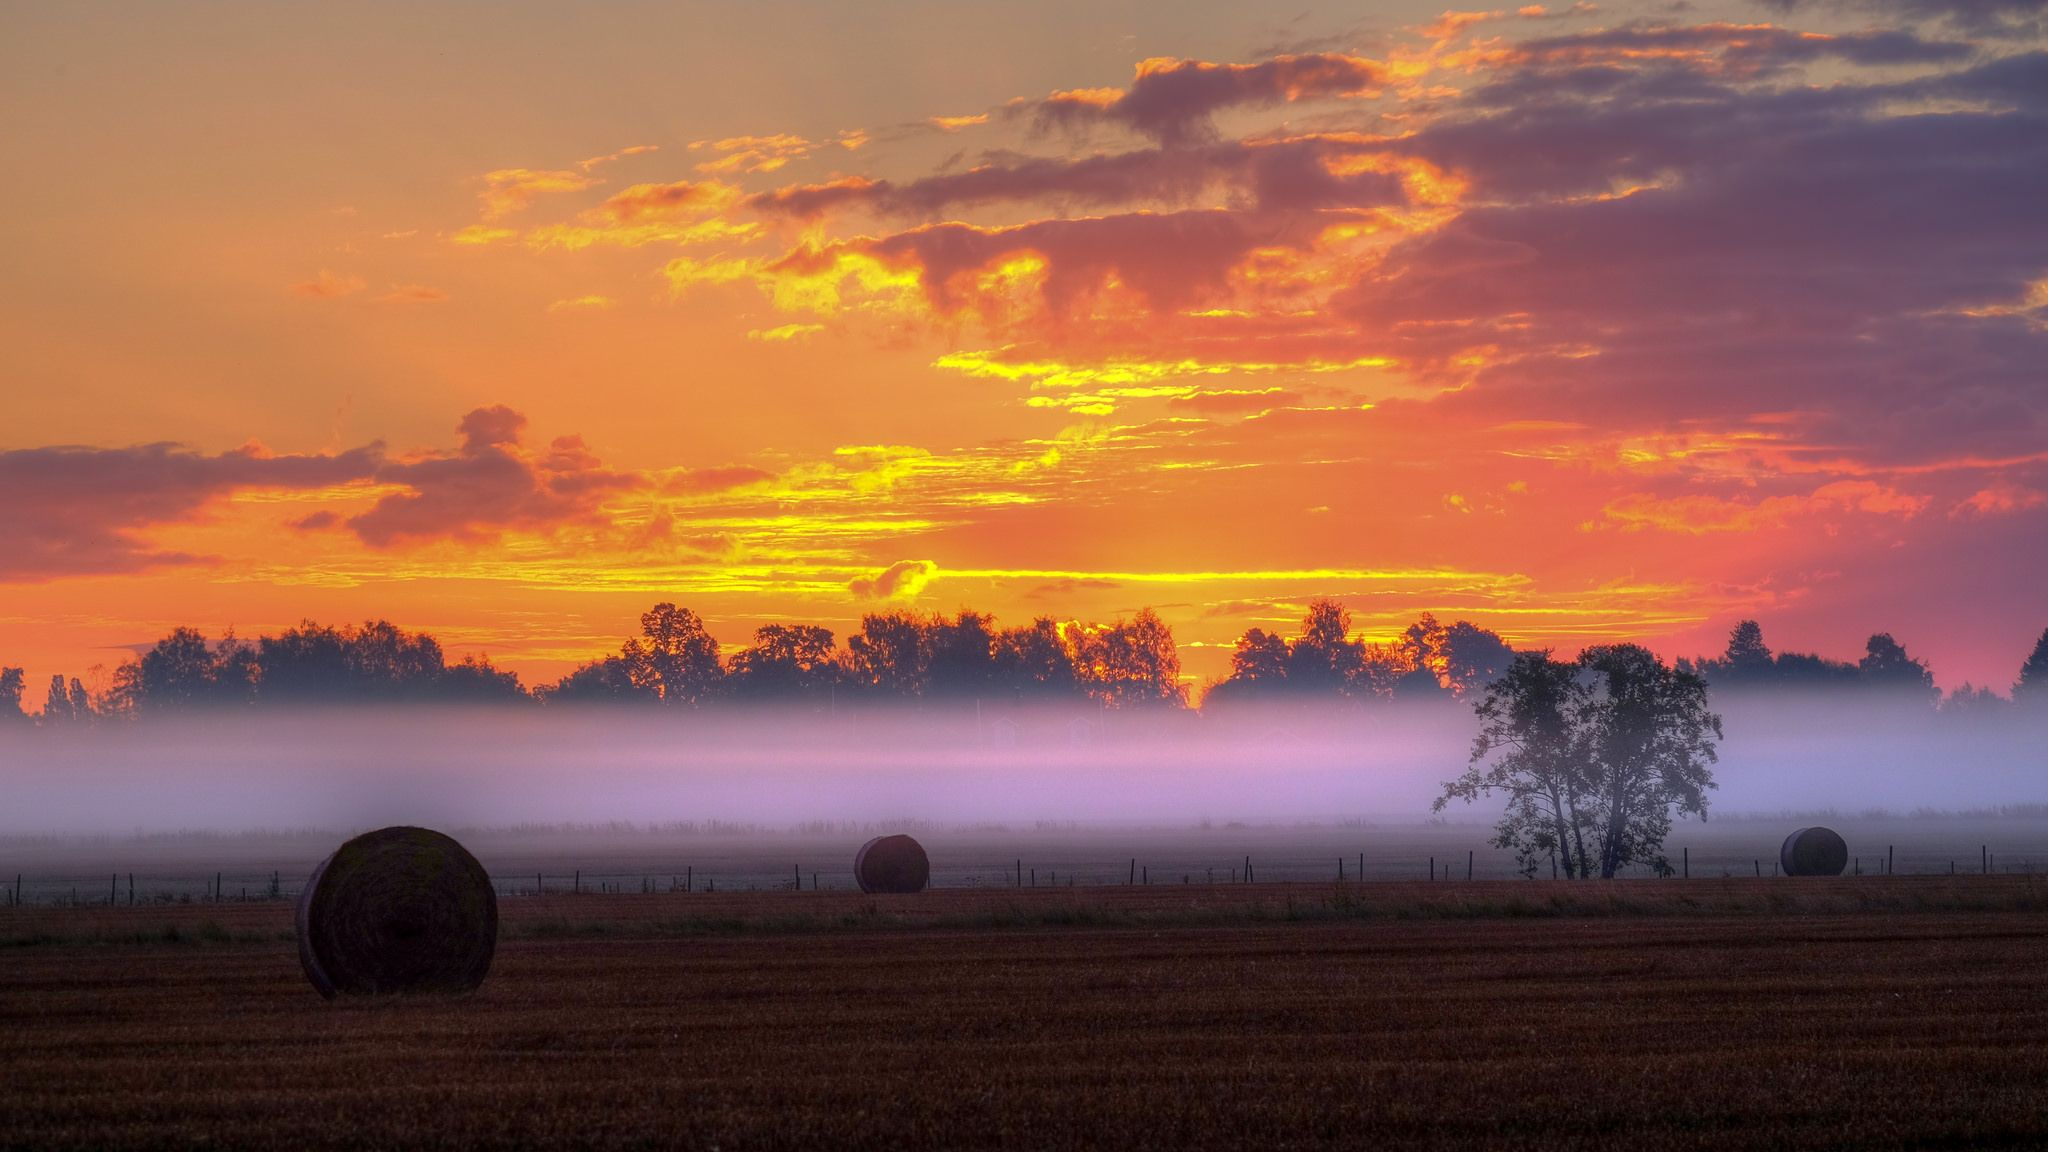 https://flic.kr/p/A8gJfP | Mist at dawn | Morning Sättuna, Sweden